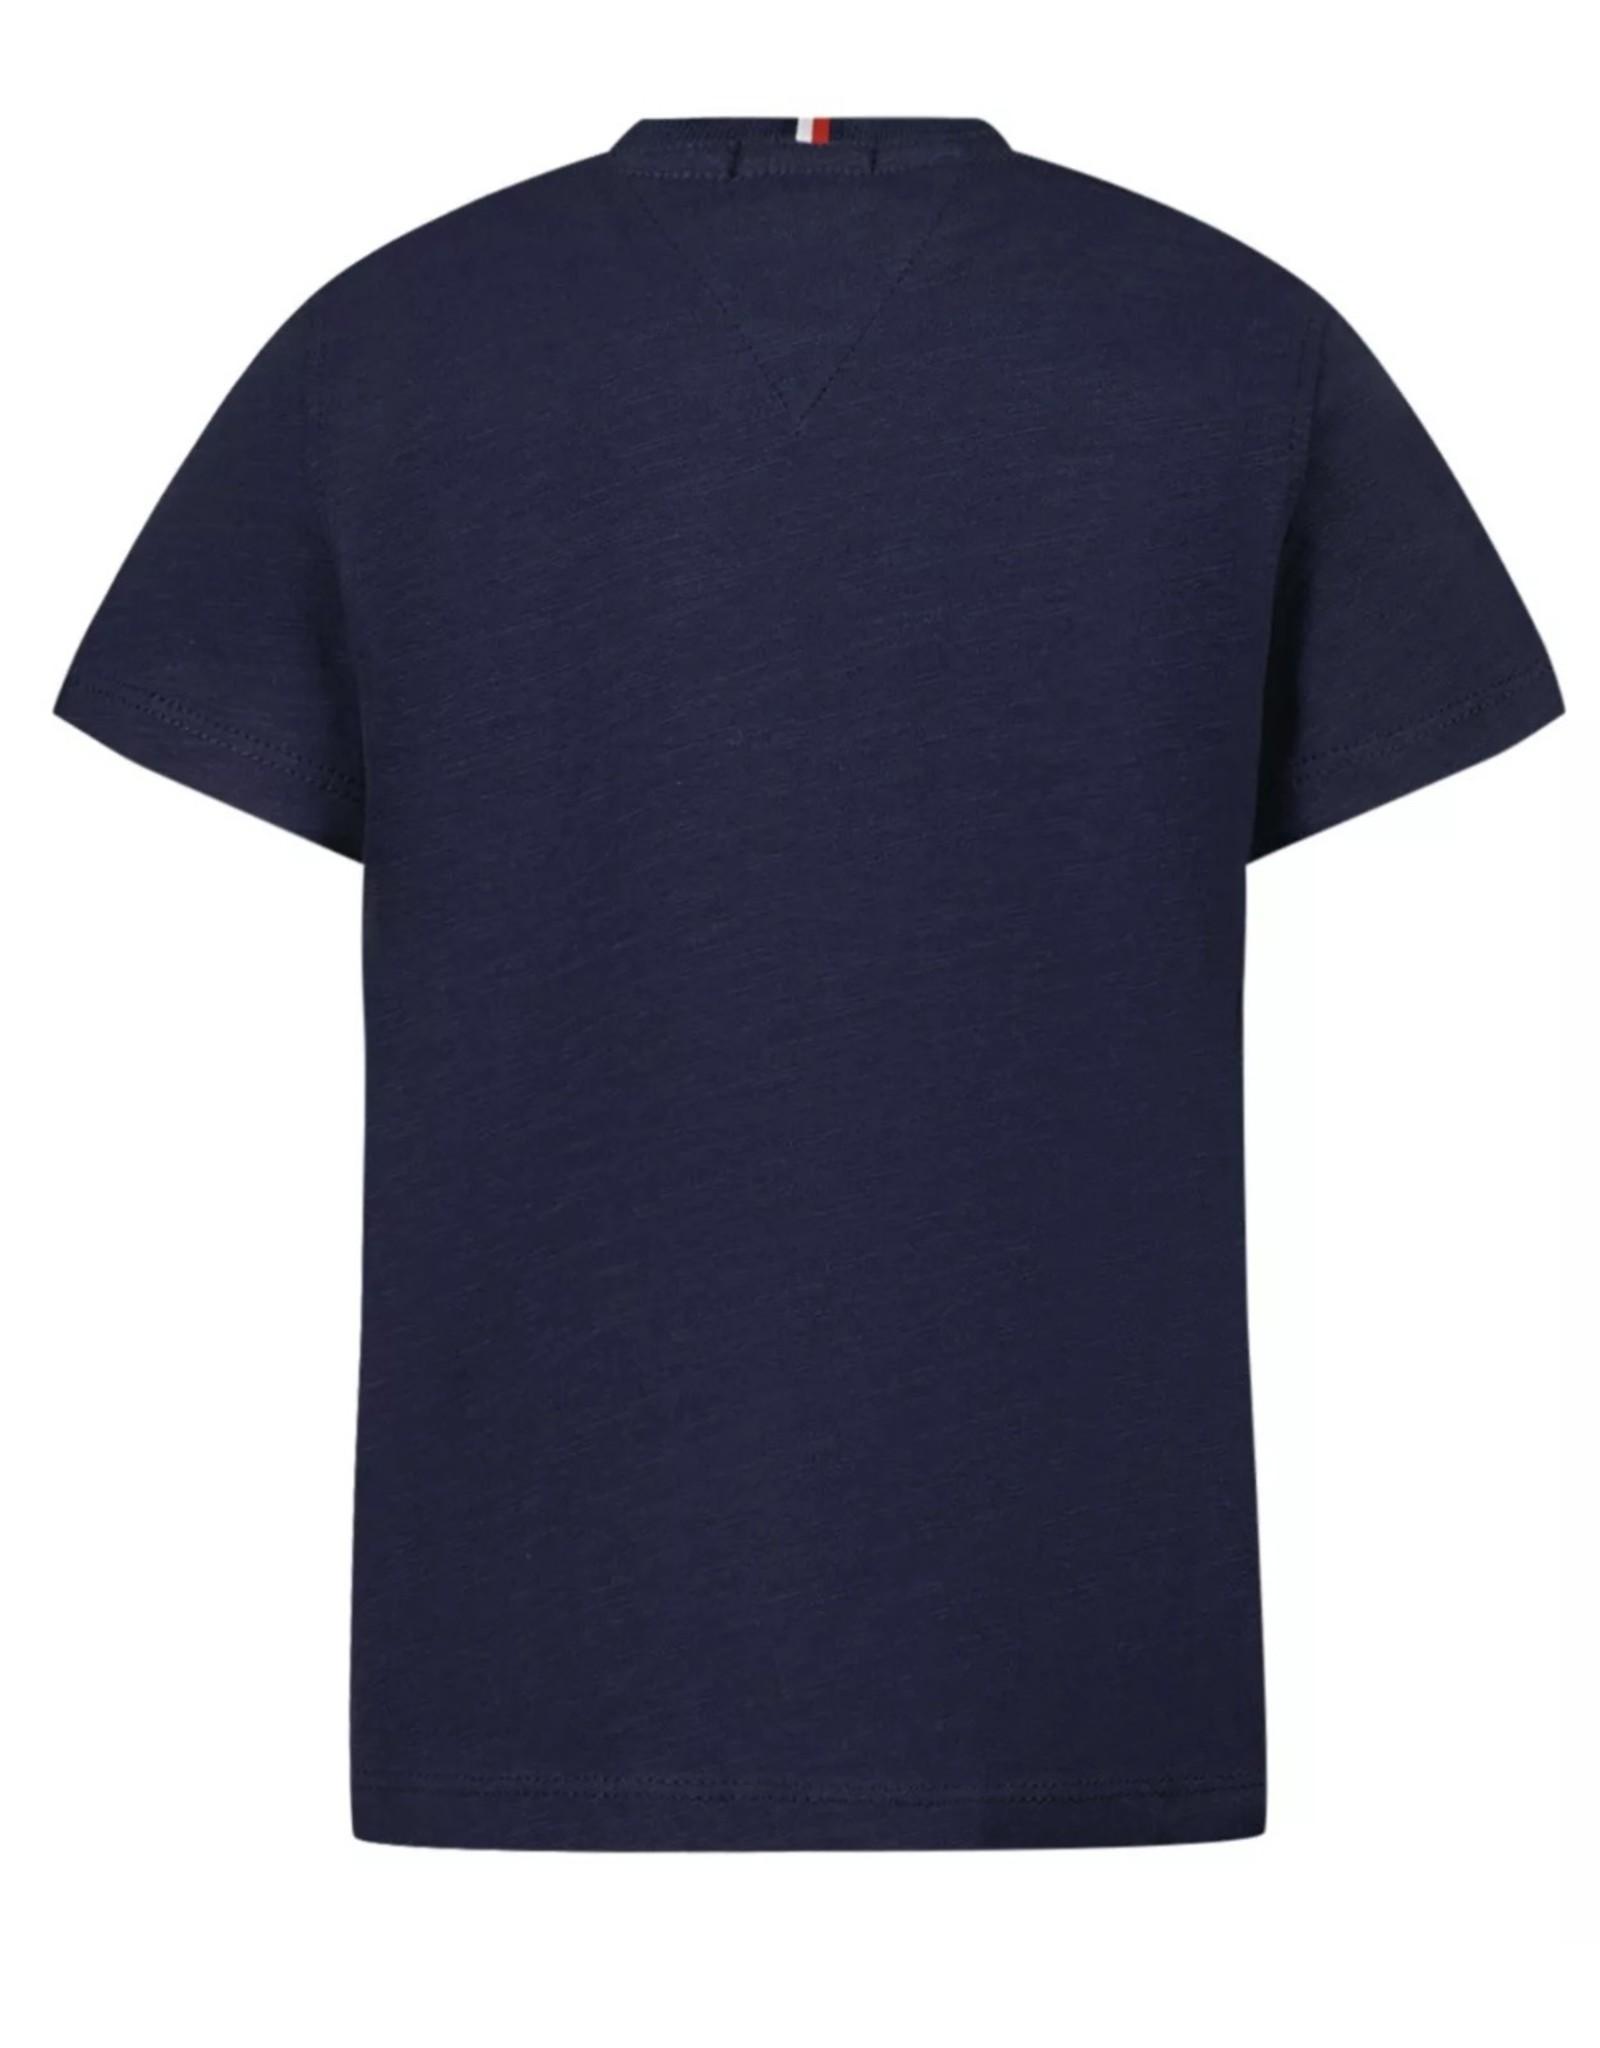 Tommy Hilfiger 6685 T-Shirt